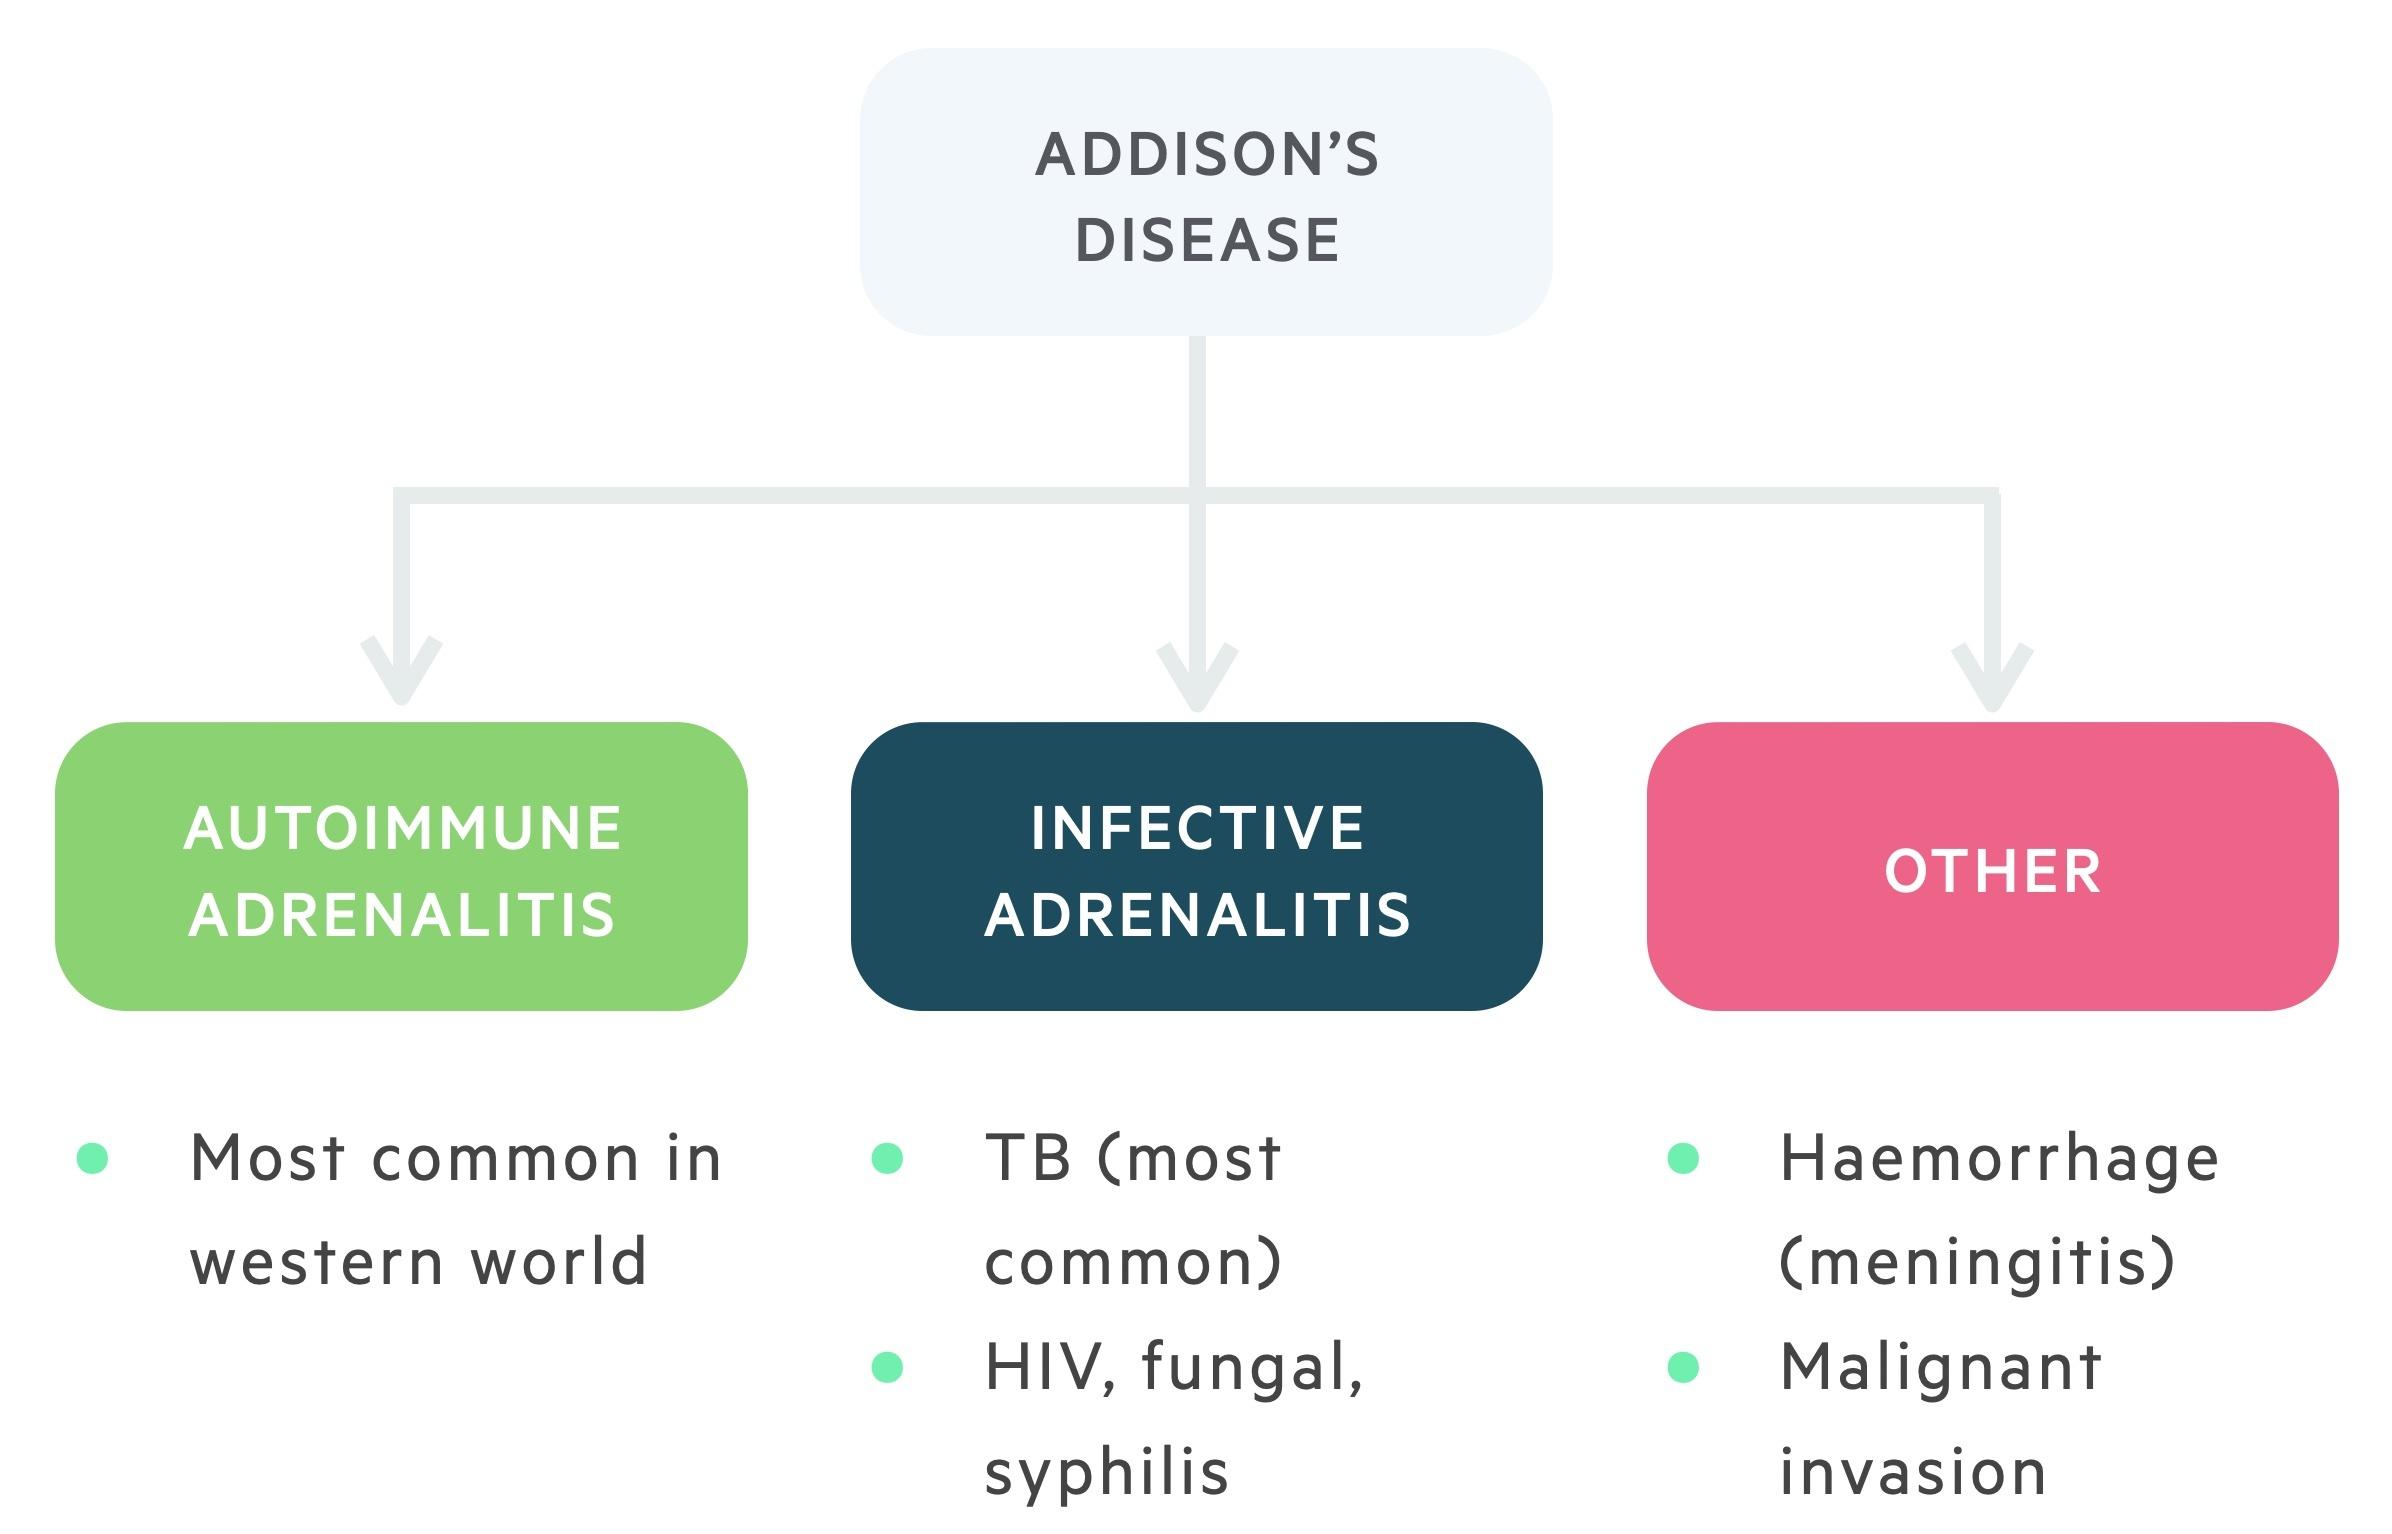 Aetiology of Addisons disease